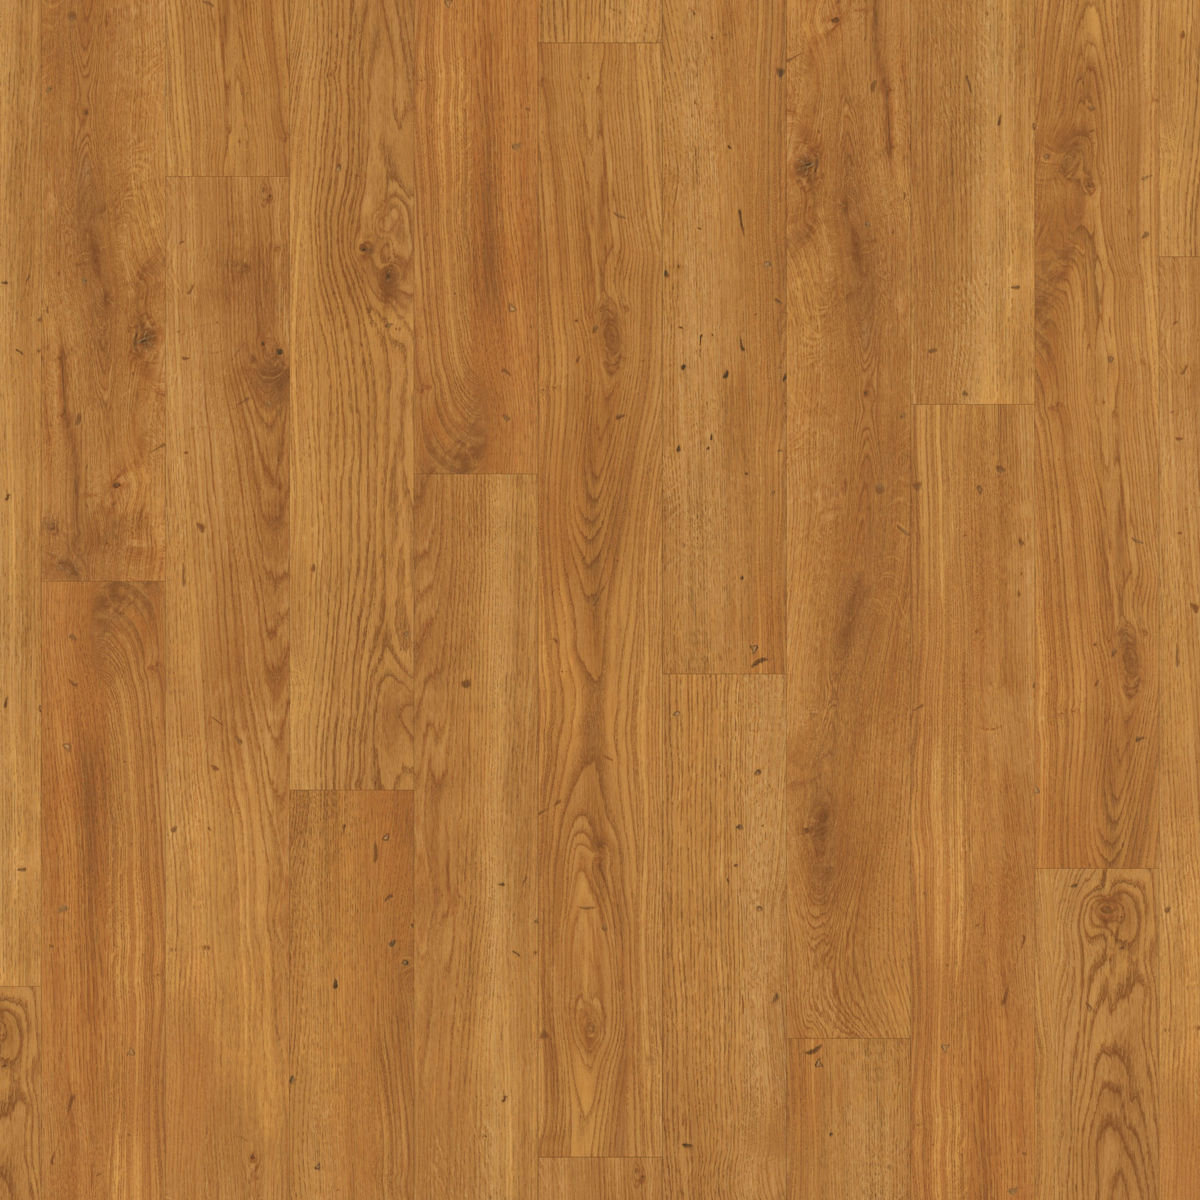 Karndean knight tile victorian oak kp91 vinyl flooring for Oak effect lino flooring